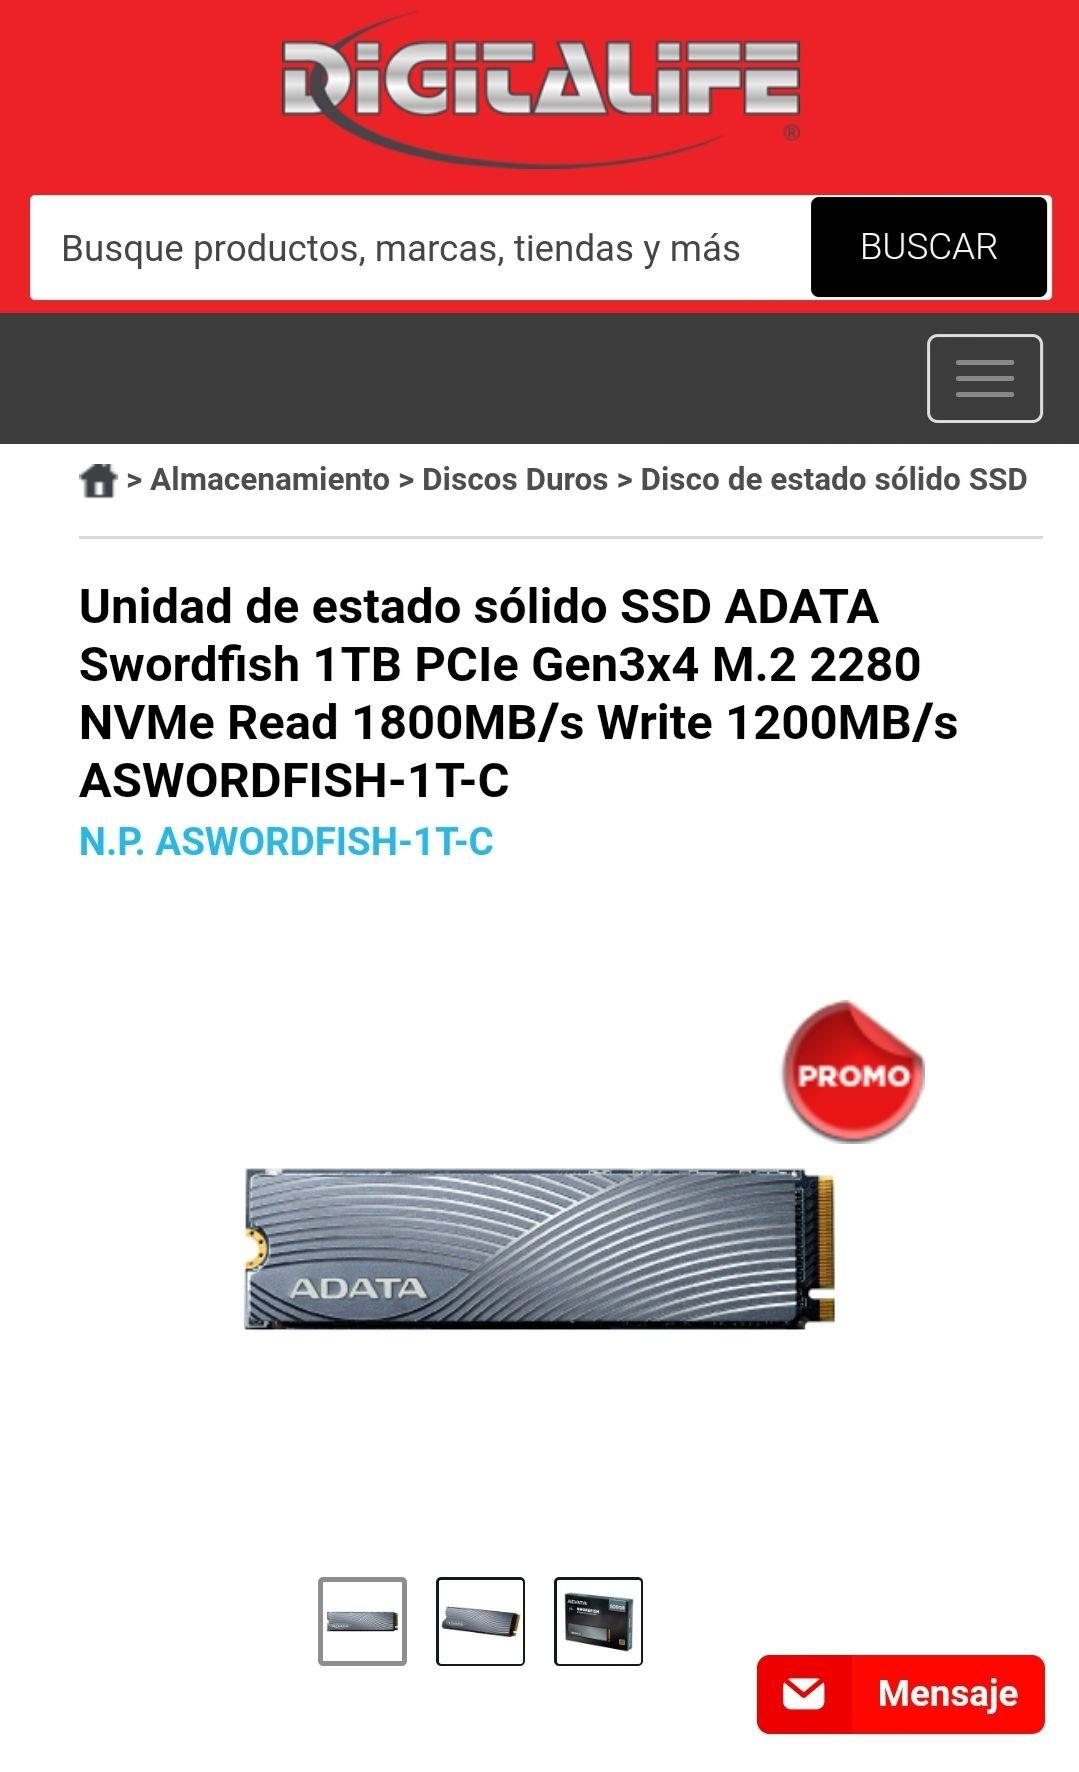 Digitalife: Unidad de estado sólido SSD ADATA Swordfish 1TB PCIe Gen3x4 M.2 2280 NVMe Read 1800MB/s Write 1200MB/s ASWORDFISH-1T-C